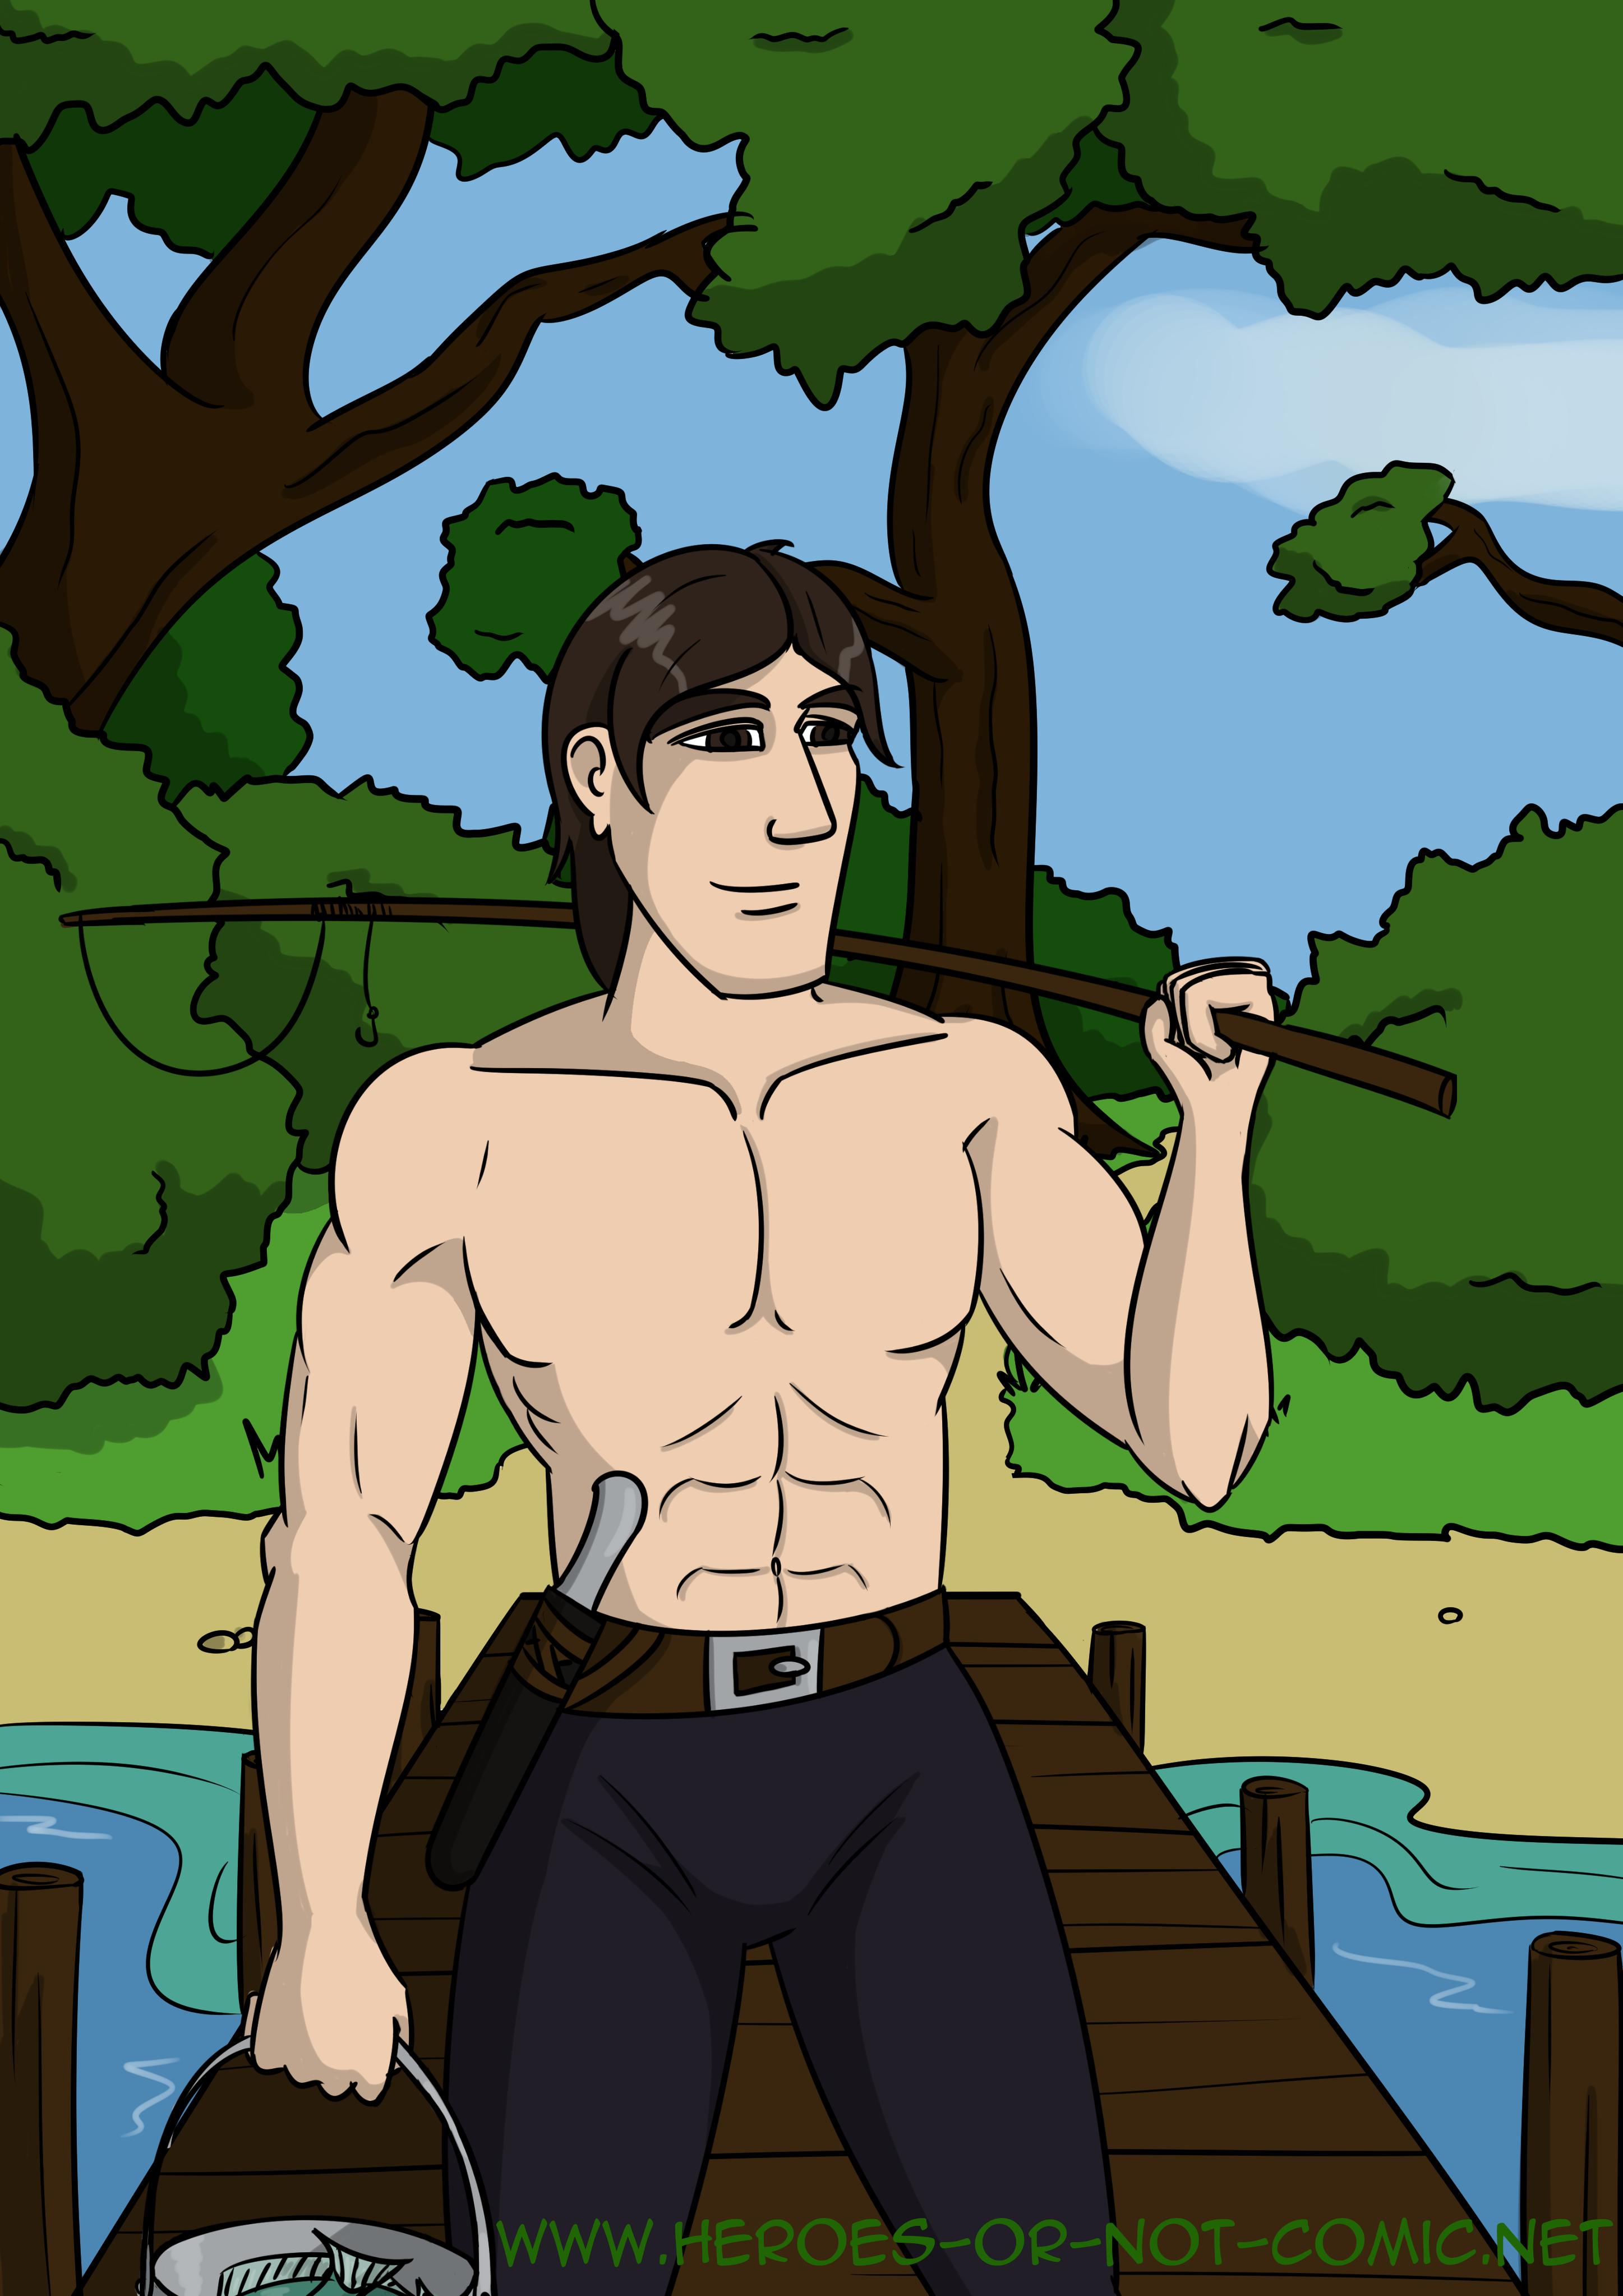 Eyldram Goes Fishing by jfDoyon